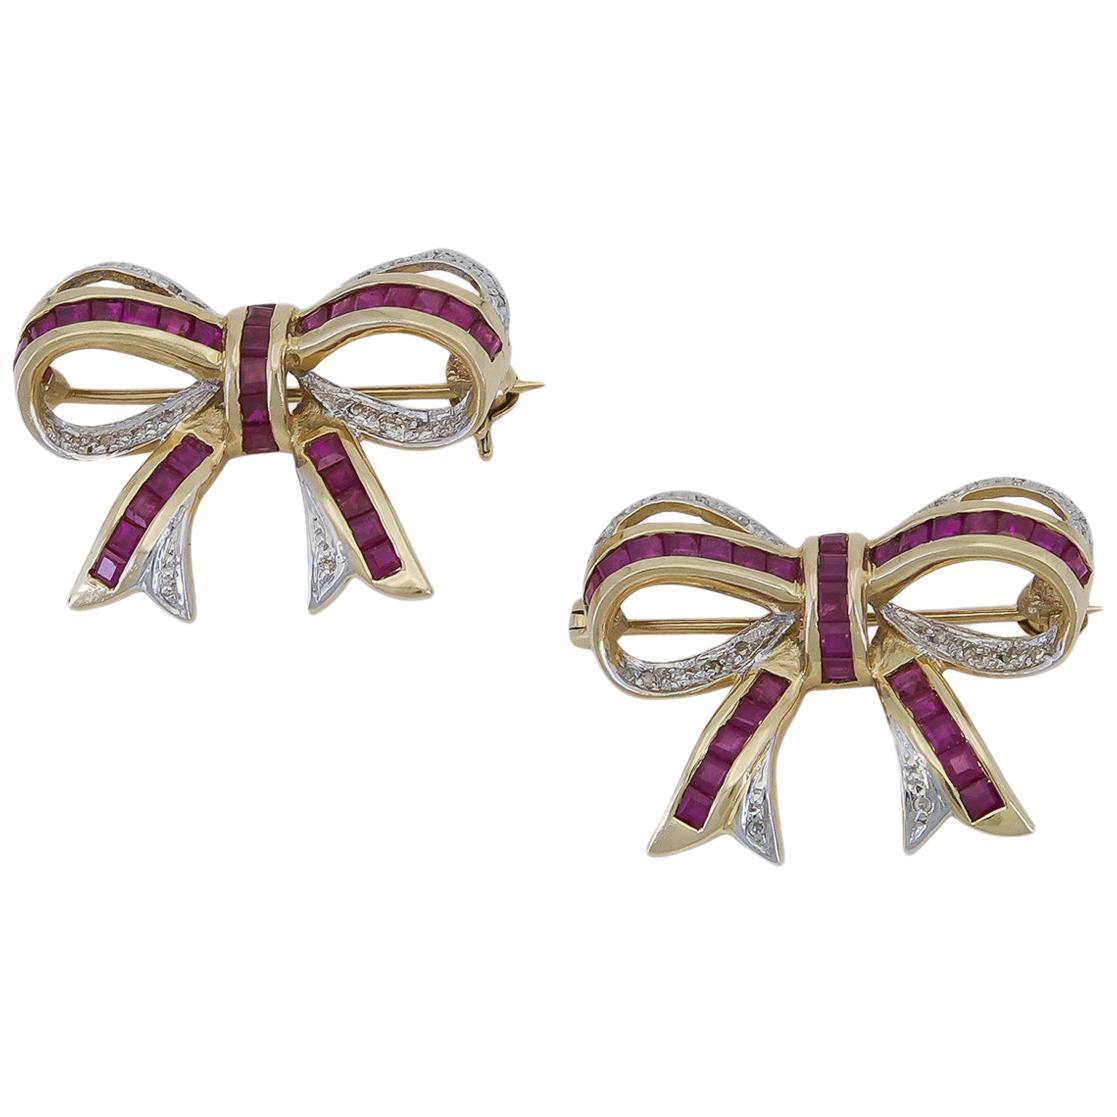 Ruby and Diamond Ribbon Brooch